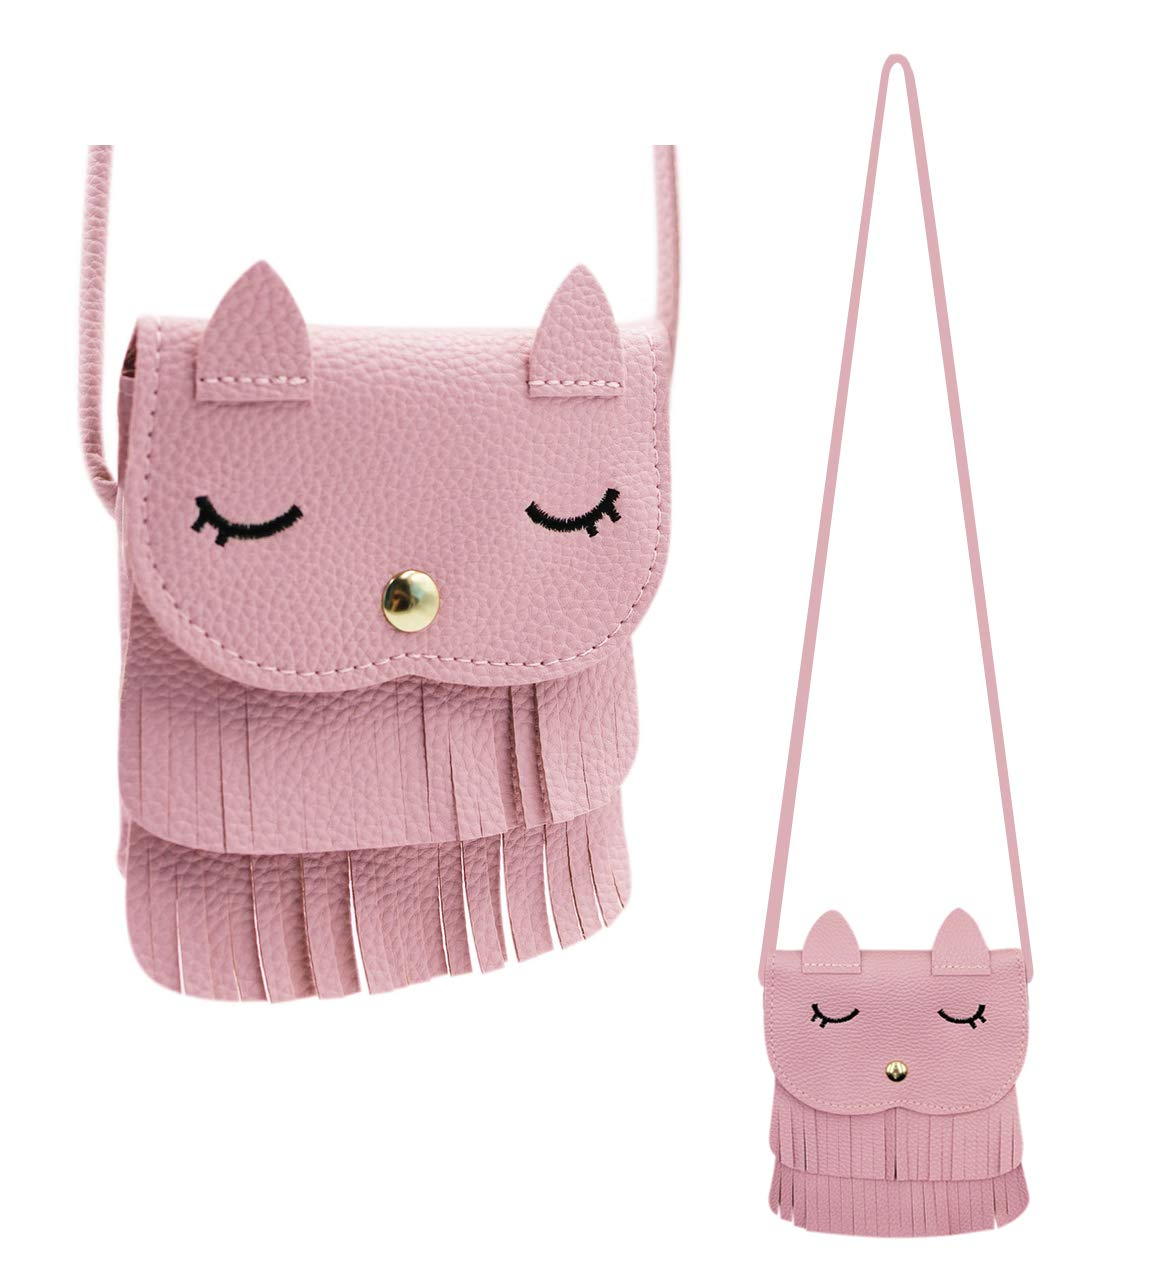 Bags us (5.15.9in) Fringe Cat Tassel Coin Purse Shoulder Bag Purse Crossbody Satchel handbags for Kids Girls